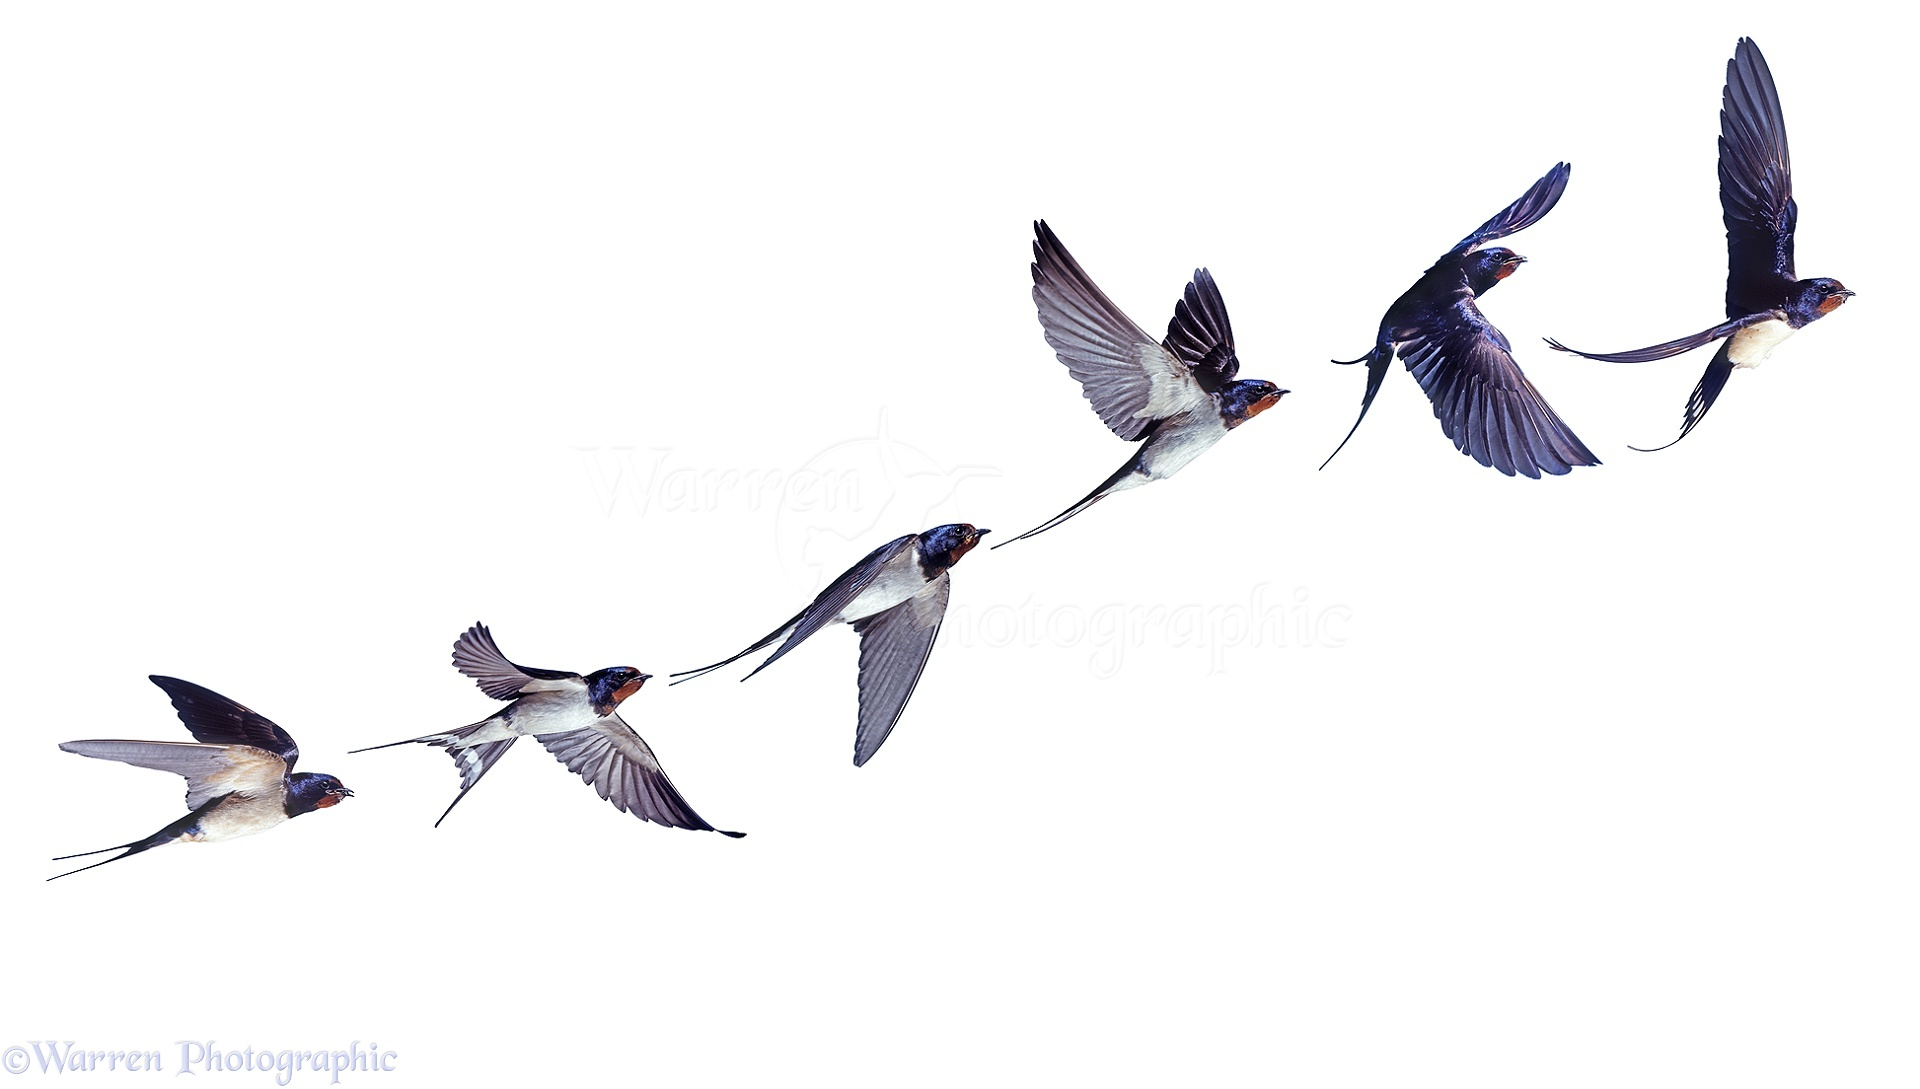 「Swallow」の画像検索結果